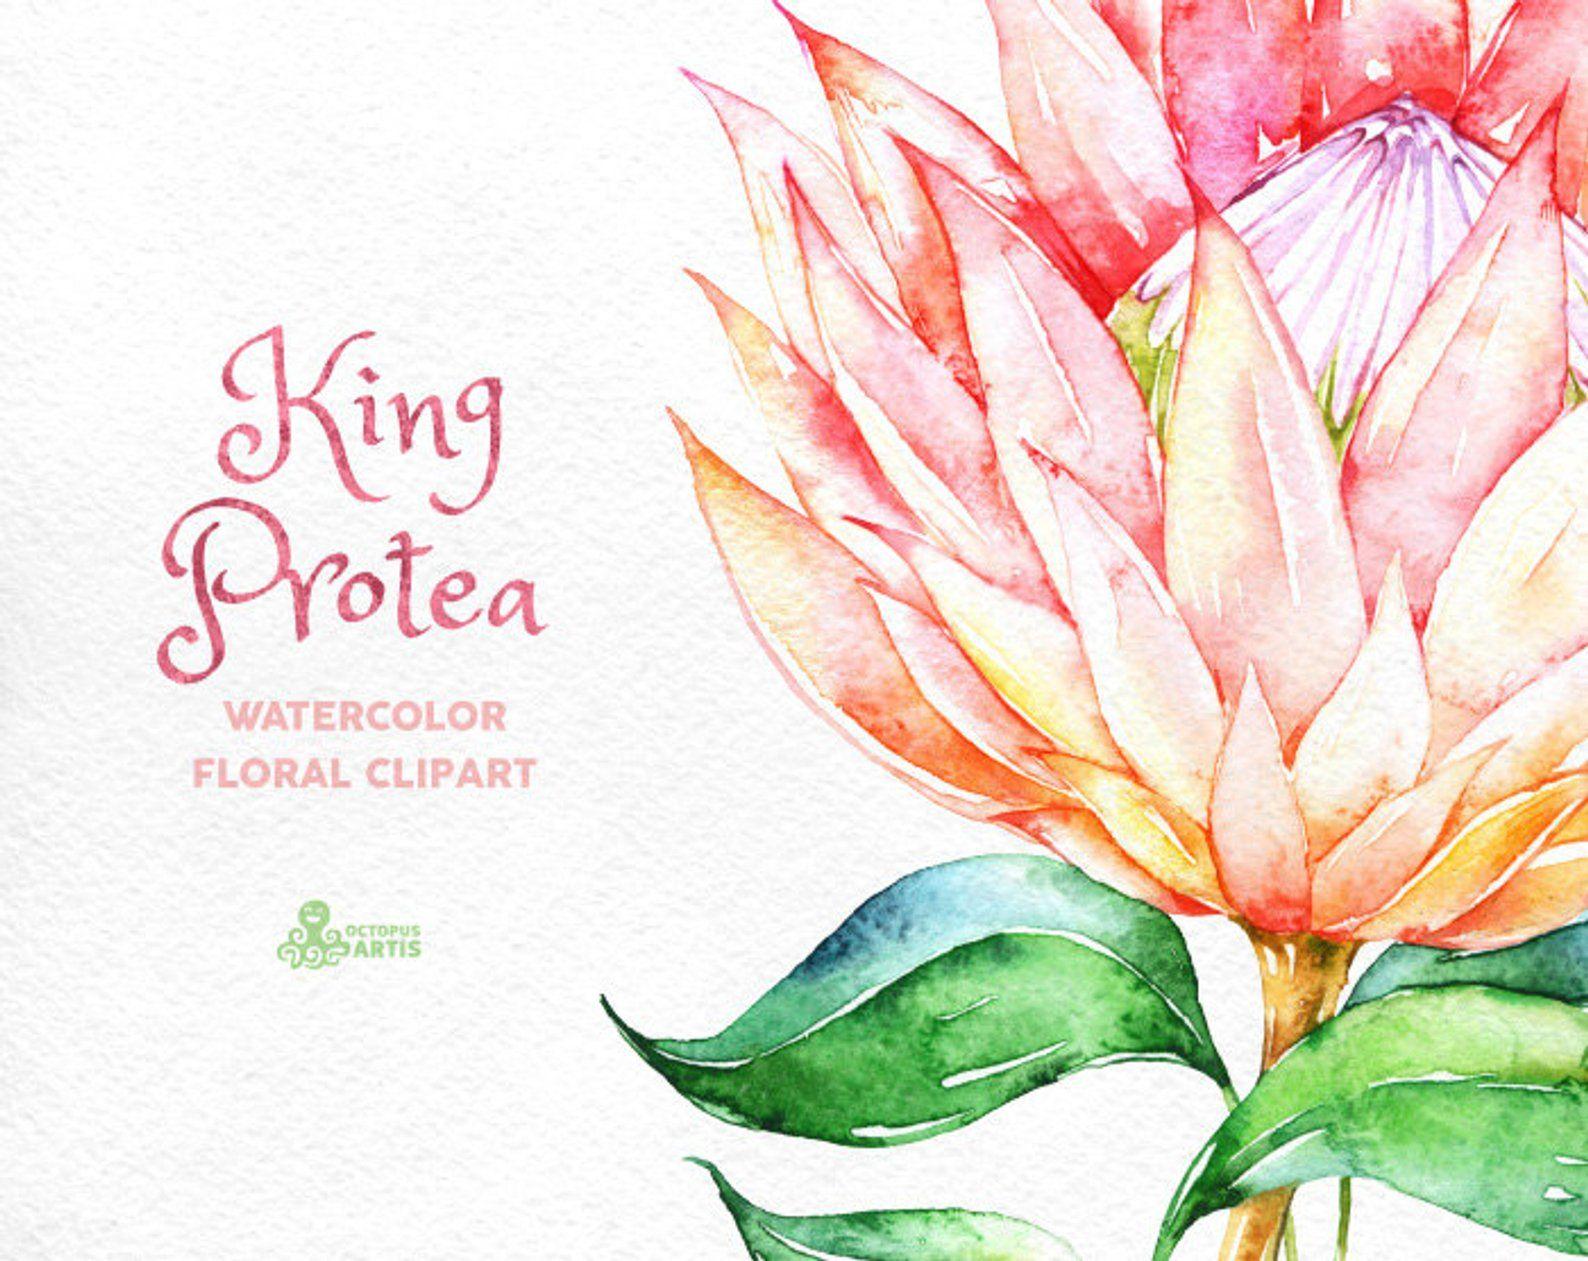 King Protea Watercolor Floral Clipart Wedding Invitation Etsy Floral Watercolor Clip Art Protea Art